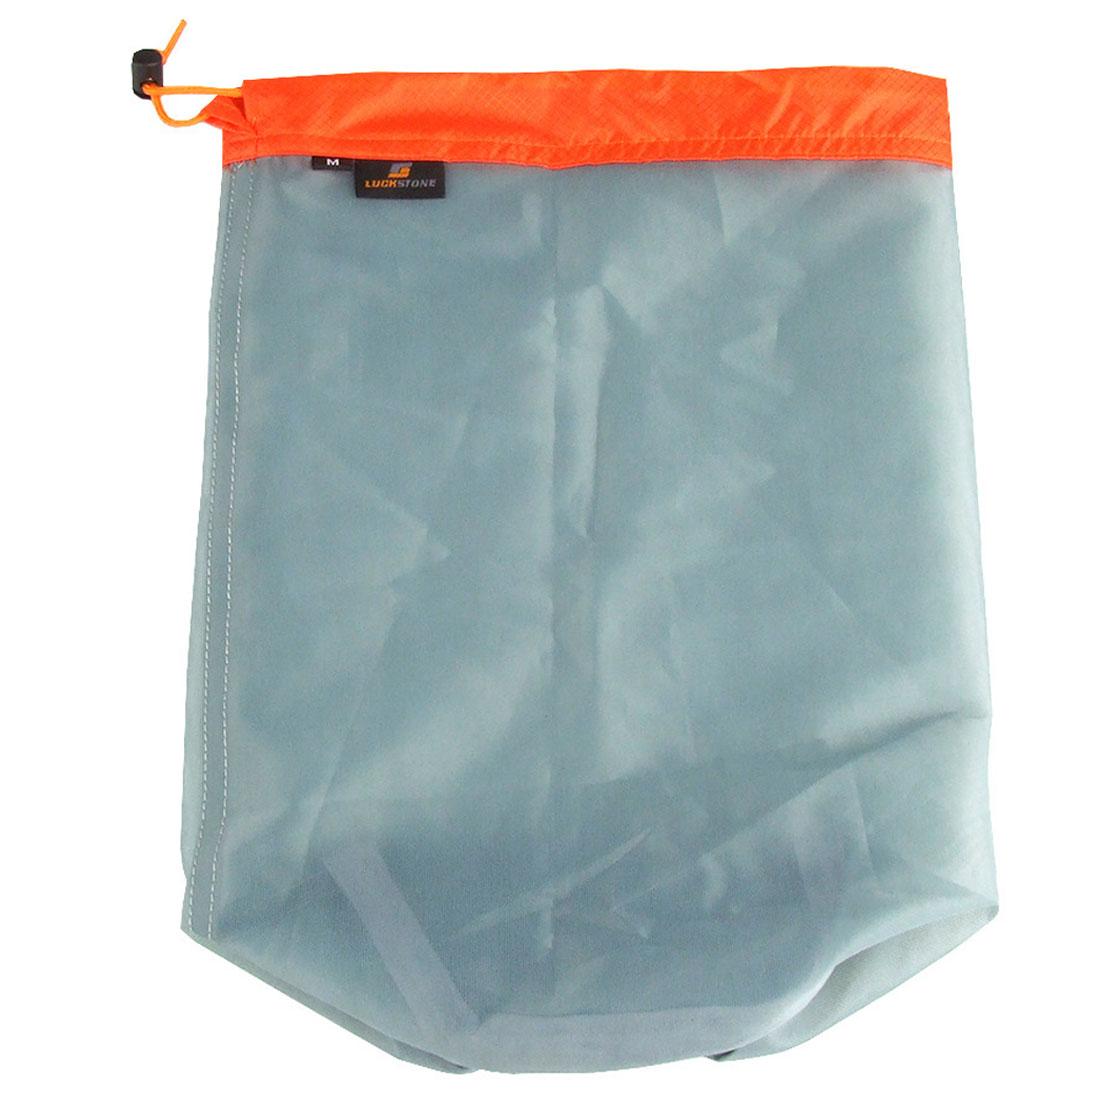 Set Mesh Sack Outdoor Organizer Clothes Drawstring Laundry S-XXL Ultralight